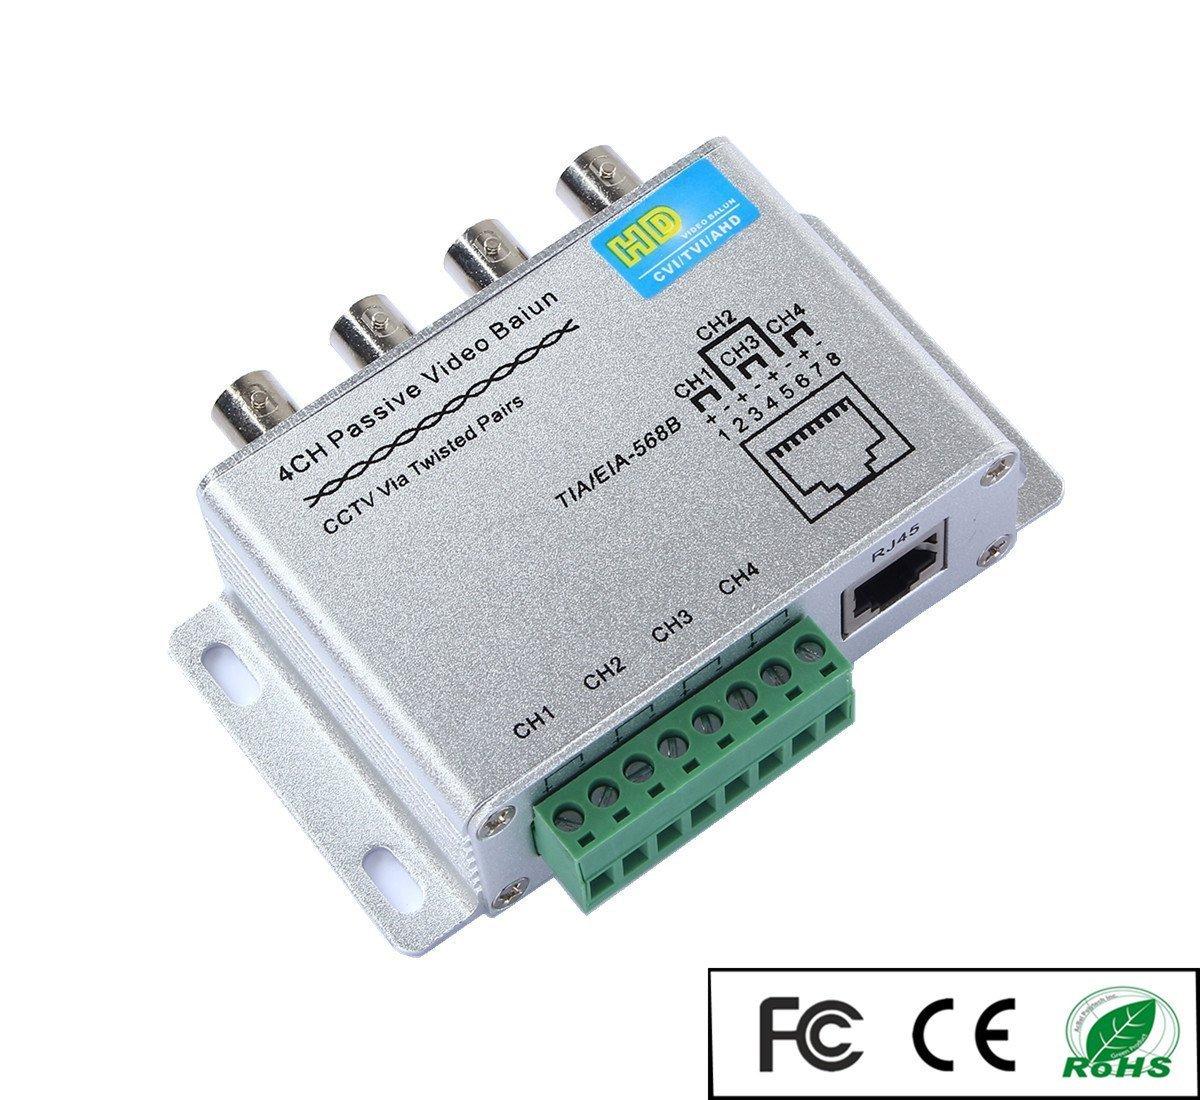 OdiySurveil(TM) 4 Channel Aluminium Alloy Shell Passive HD-CVI/TVI/AHD CCTV Camera Transceiver,BNC RJ45 UTP Video Balun,720P/1080P